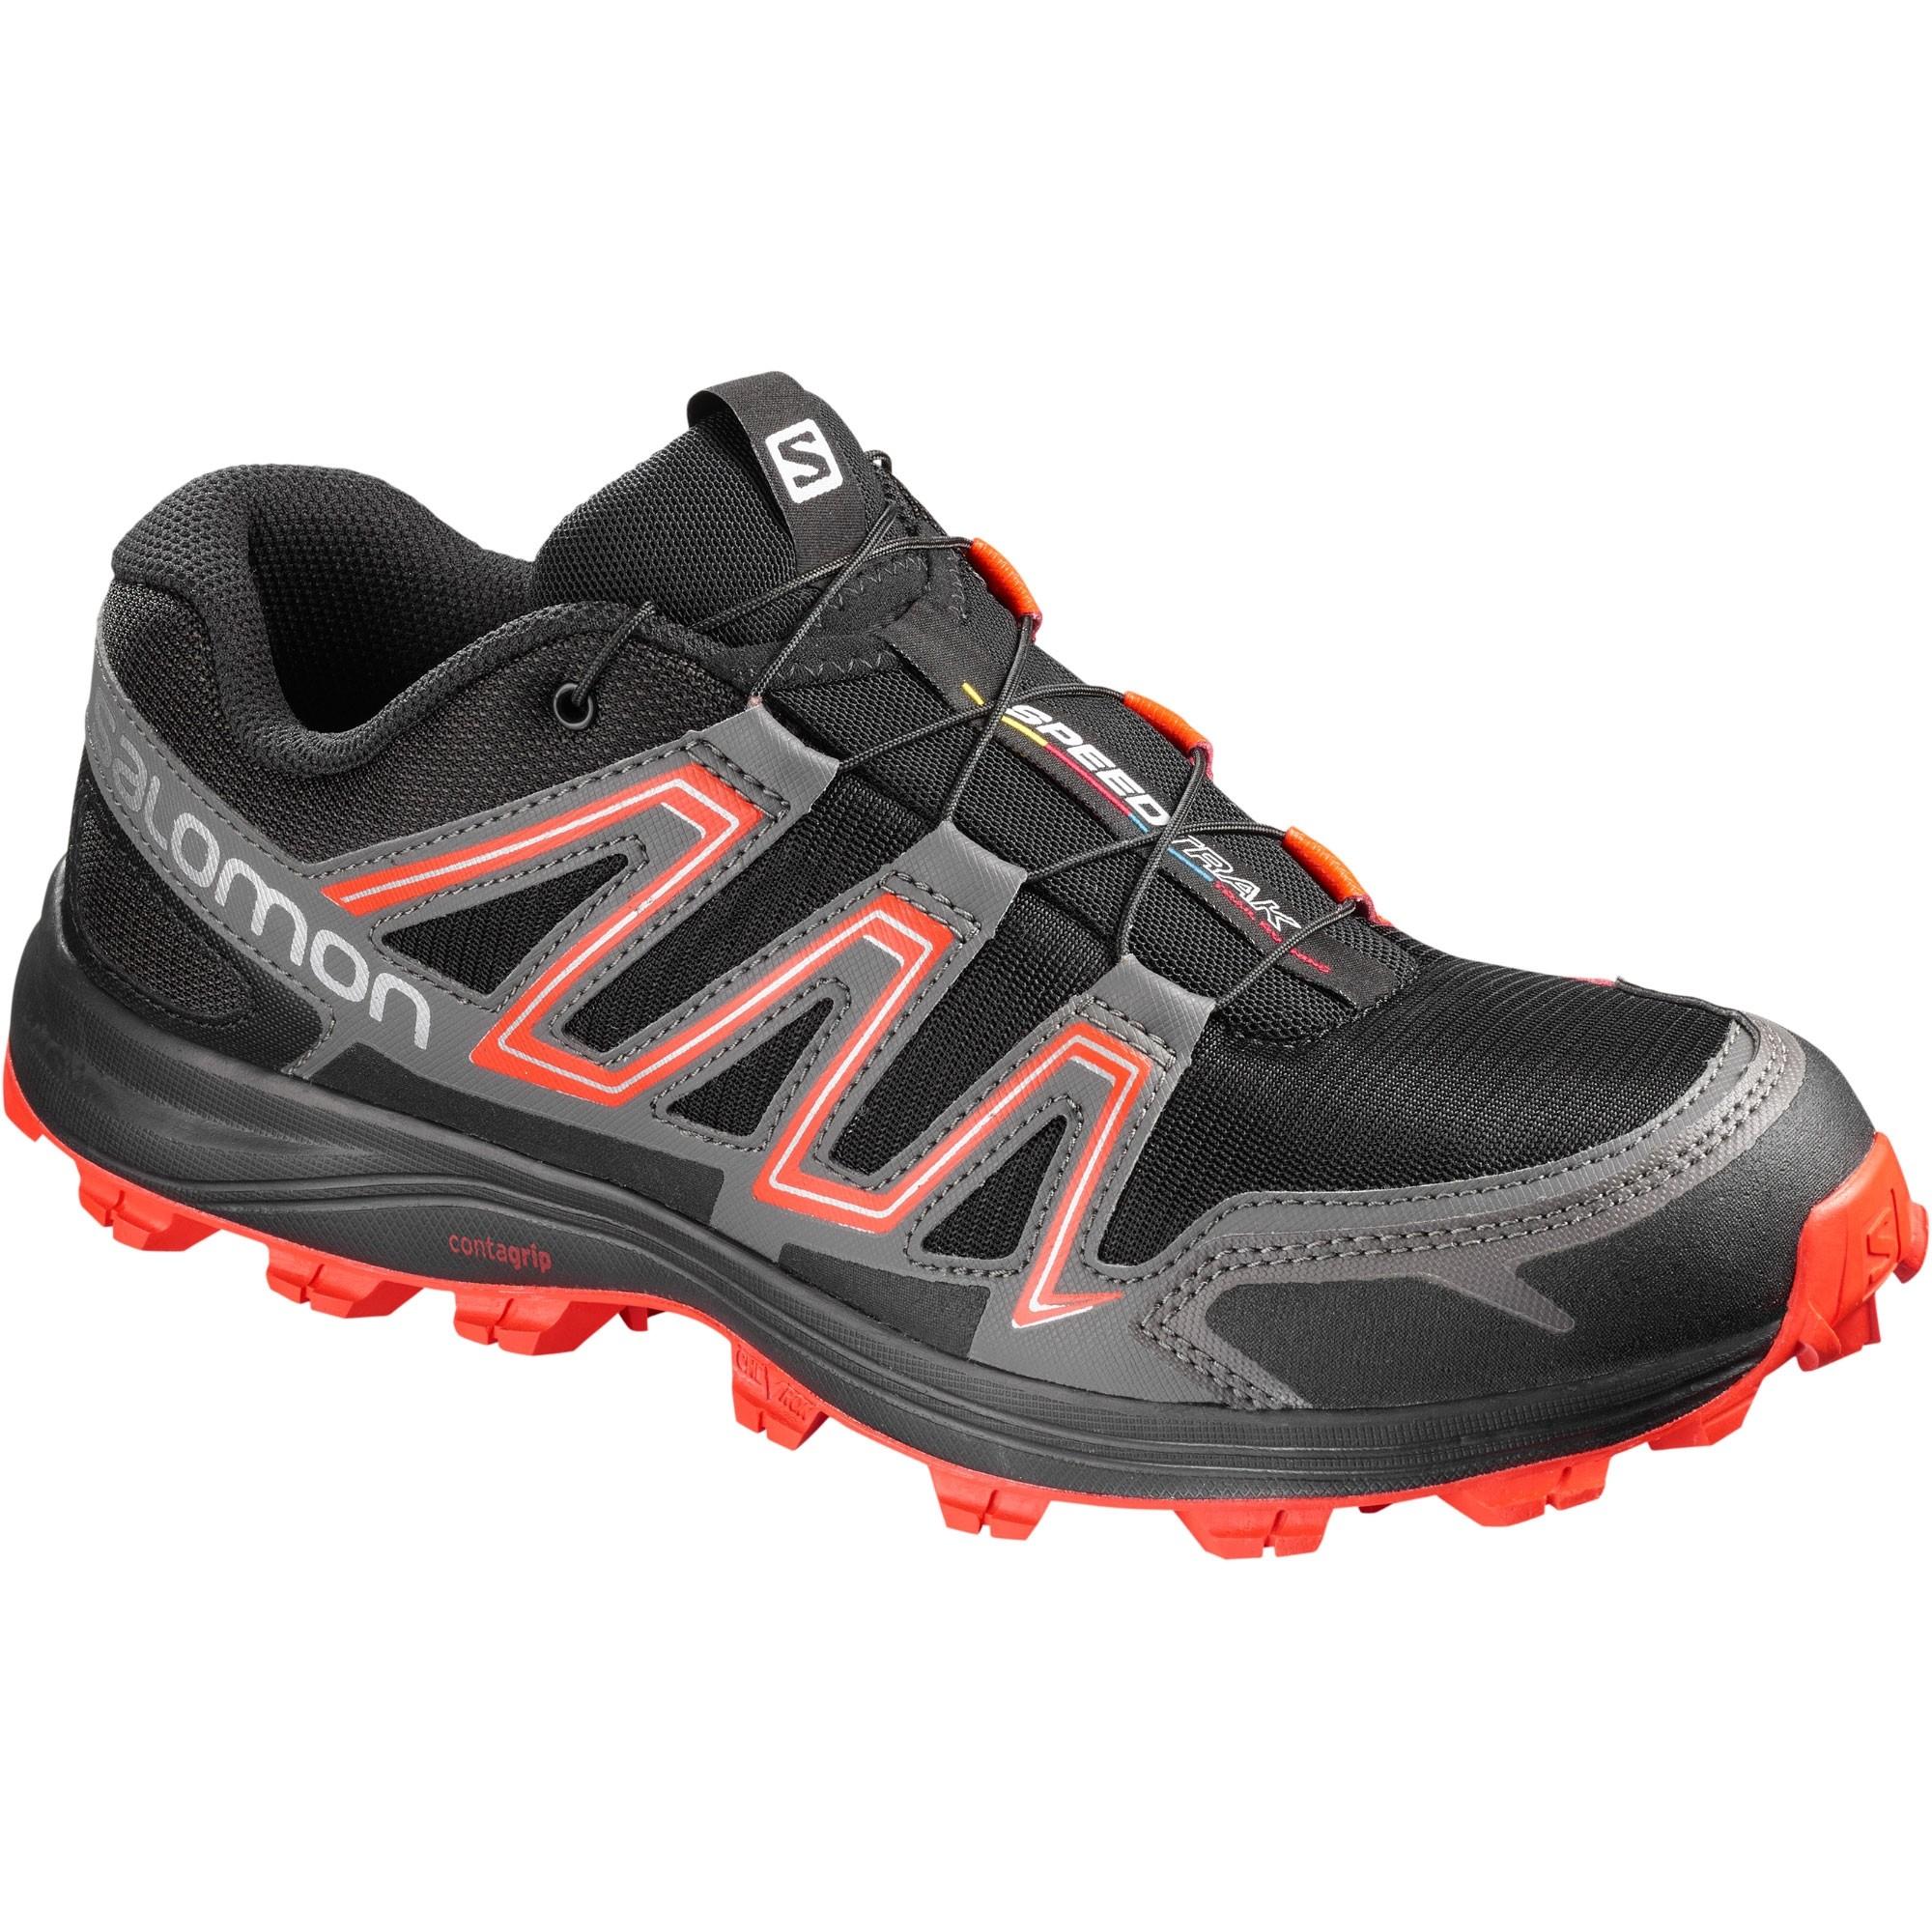 Salomon SpeedTrak Trail Running Shoe - Black/Magnet/Cherry Tomato